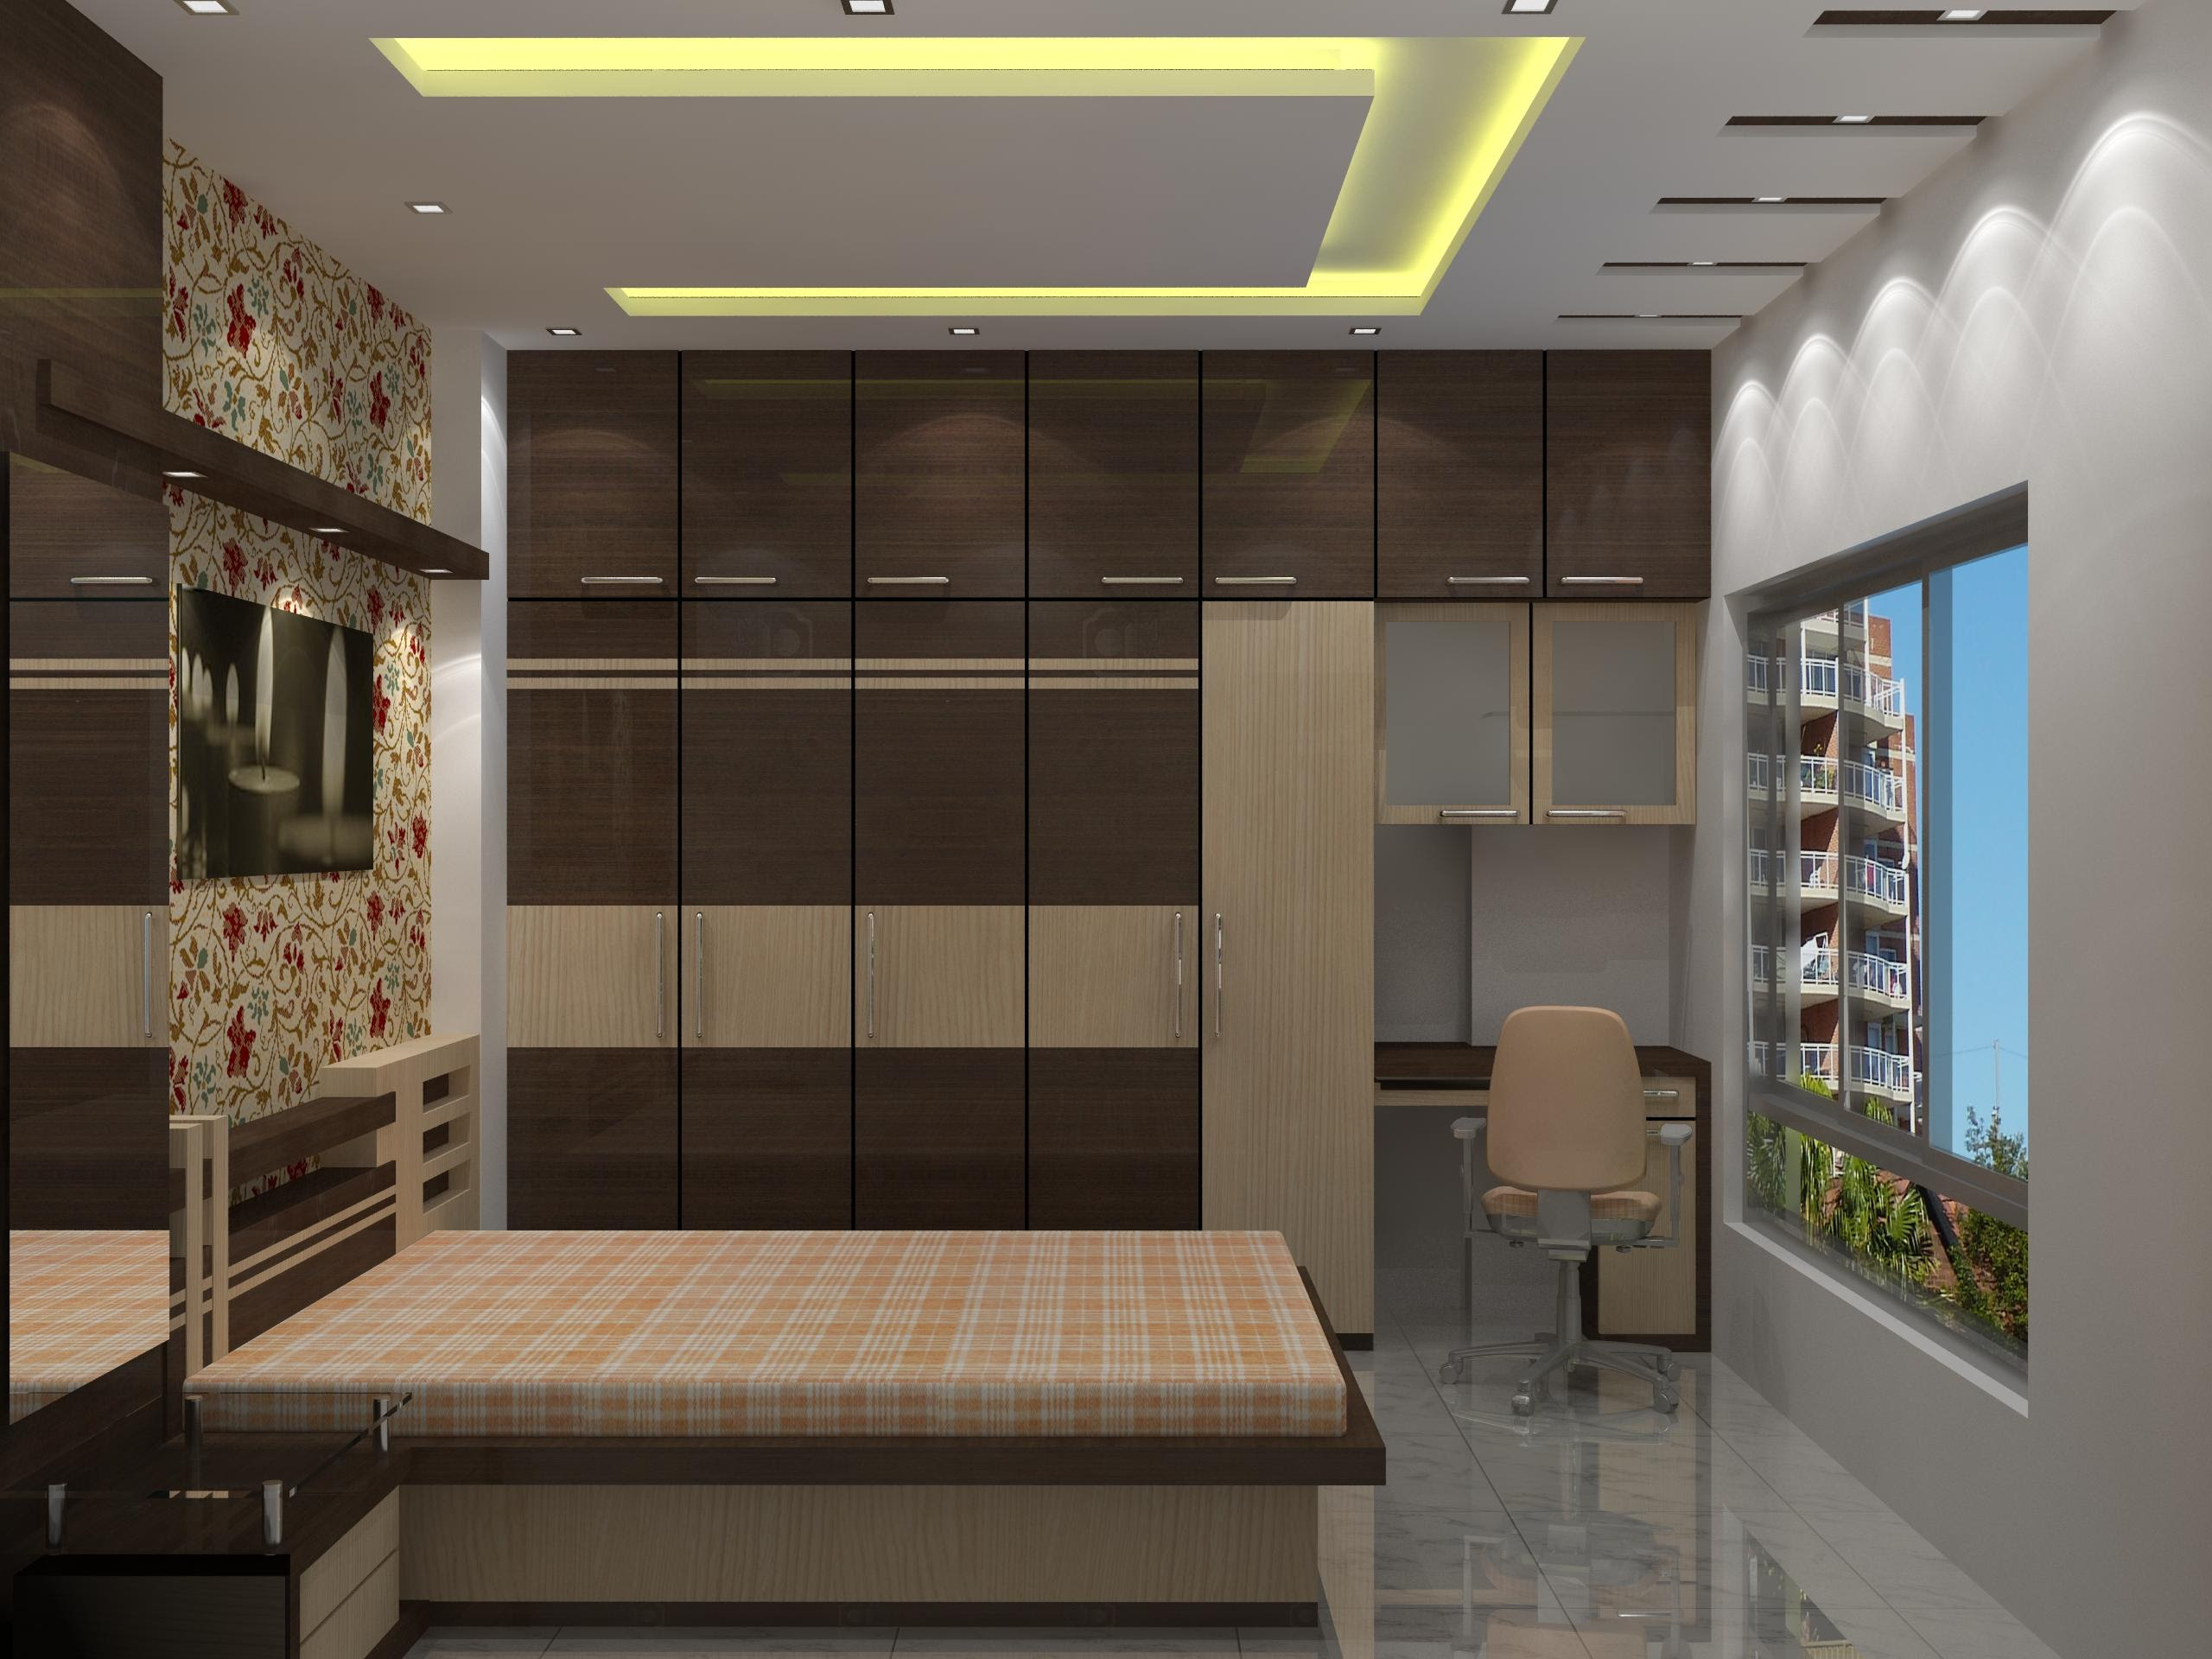 Bedroom With False Ceiling Work Gharexpert